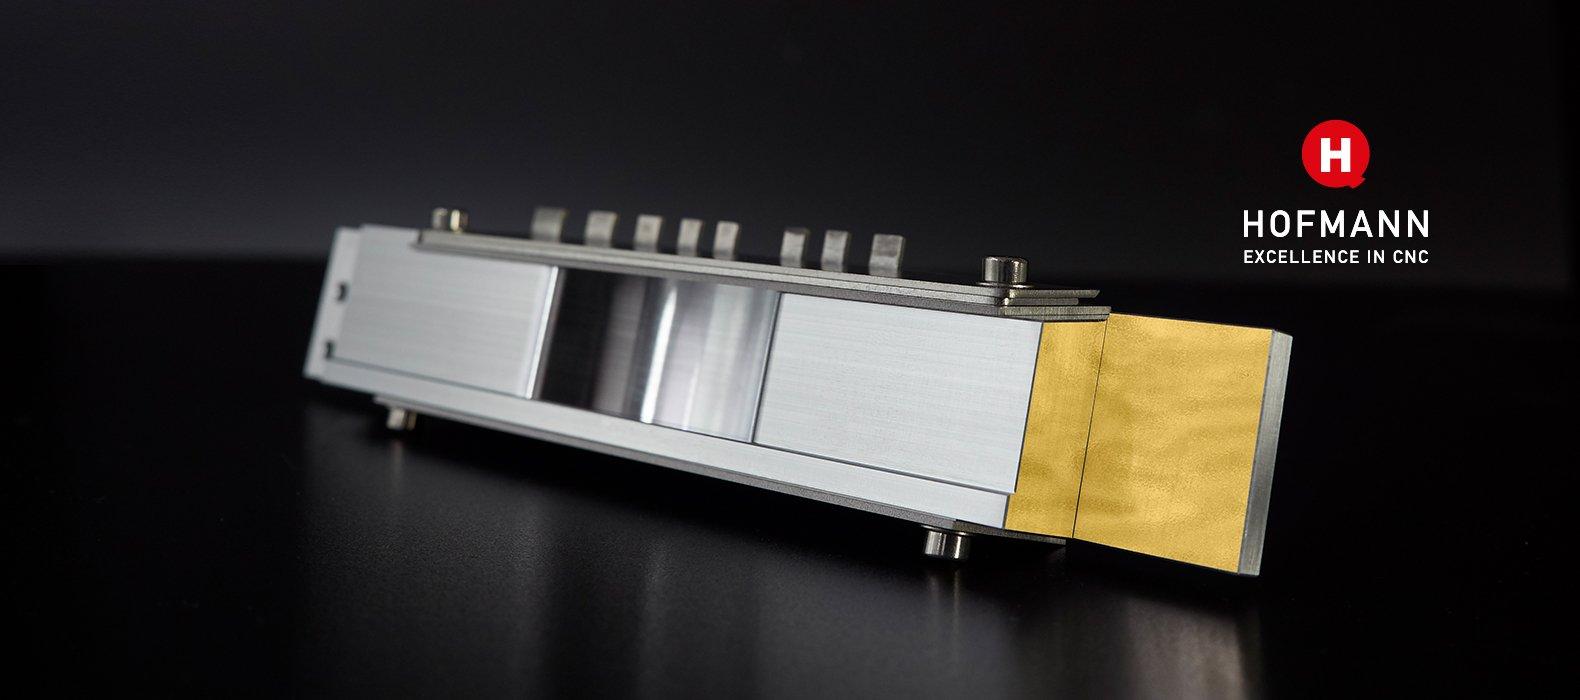 Wolfram kleben Medizintechnik · Hofmann CNC